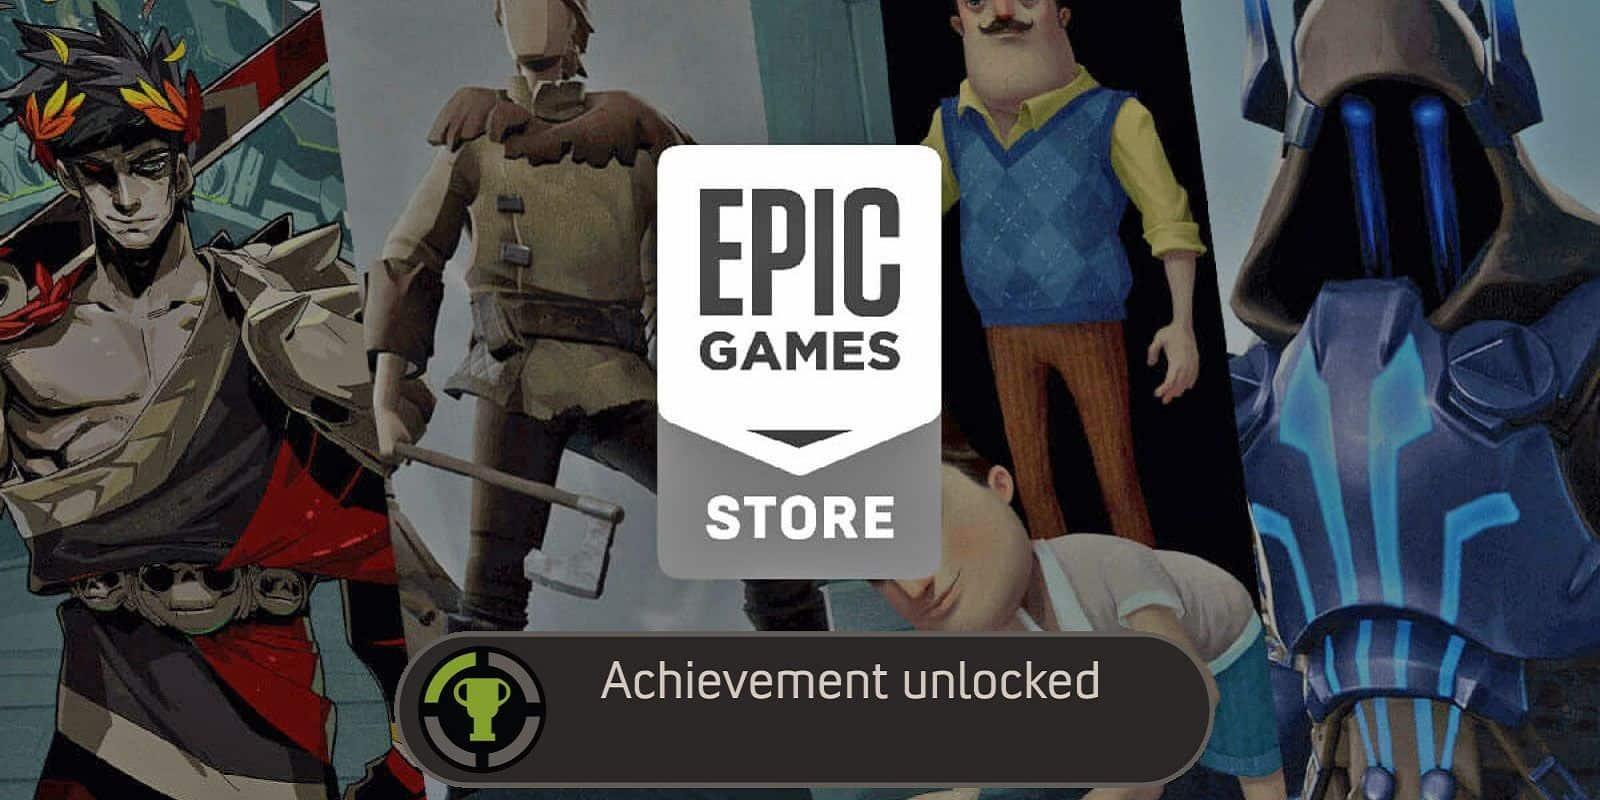 epic games store achievementy 2